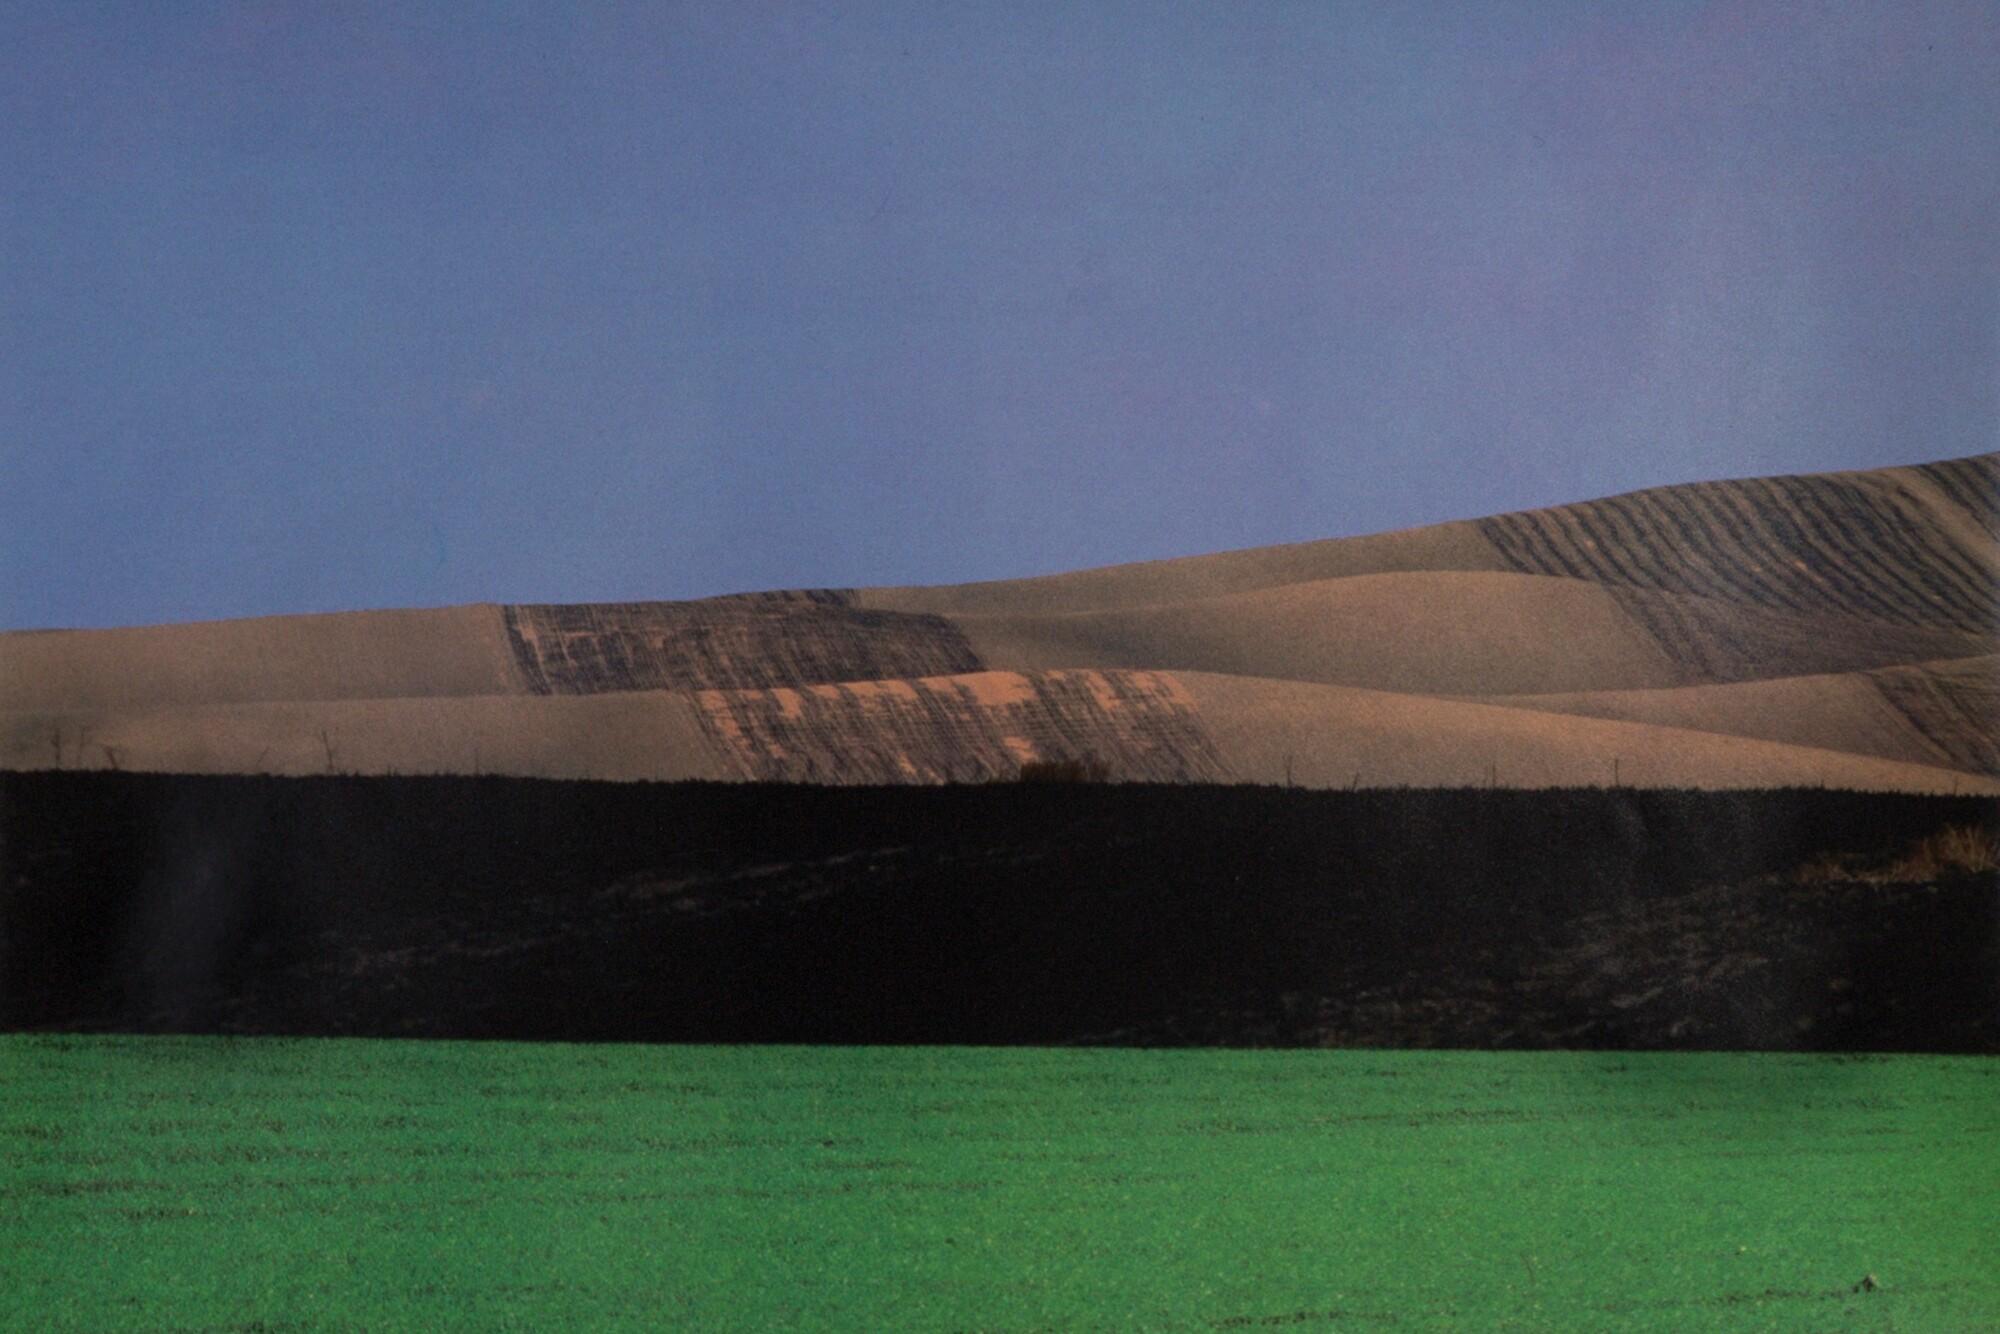 Пейзаж, 1990. Фотограф Франко Фонтана